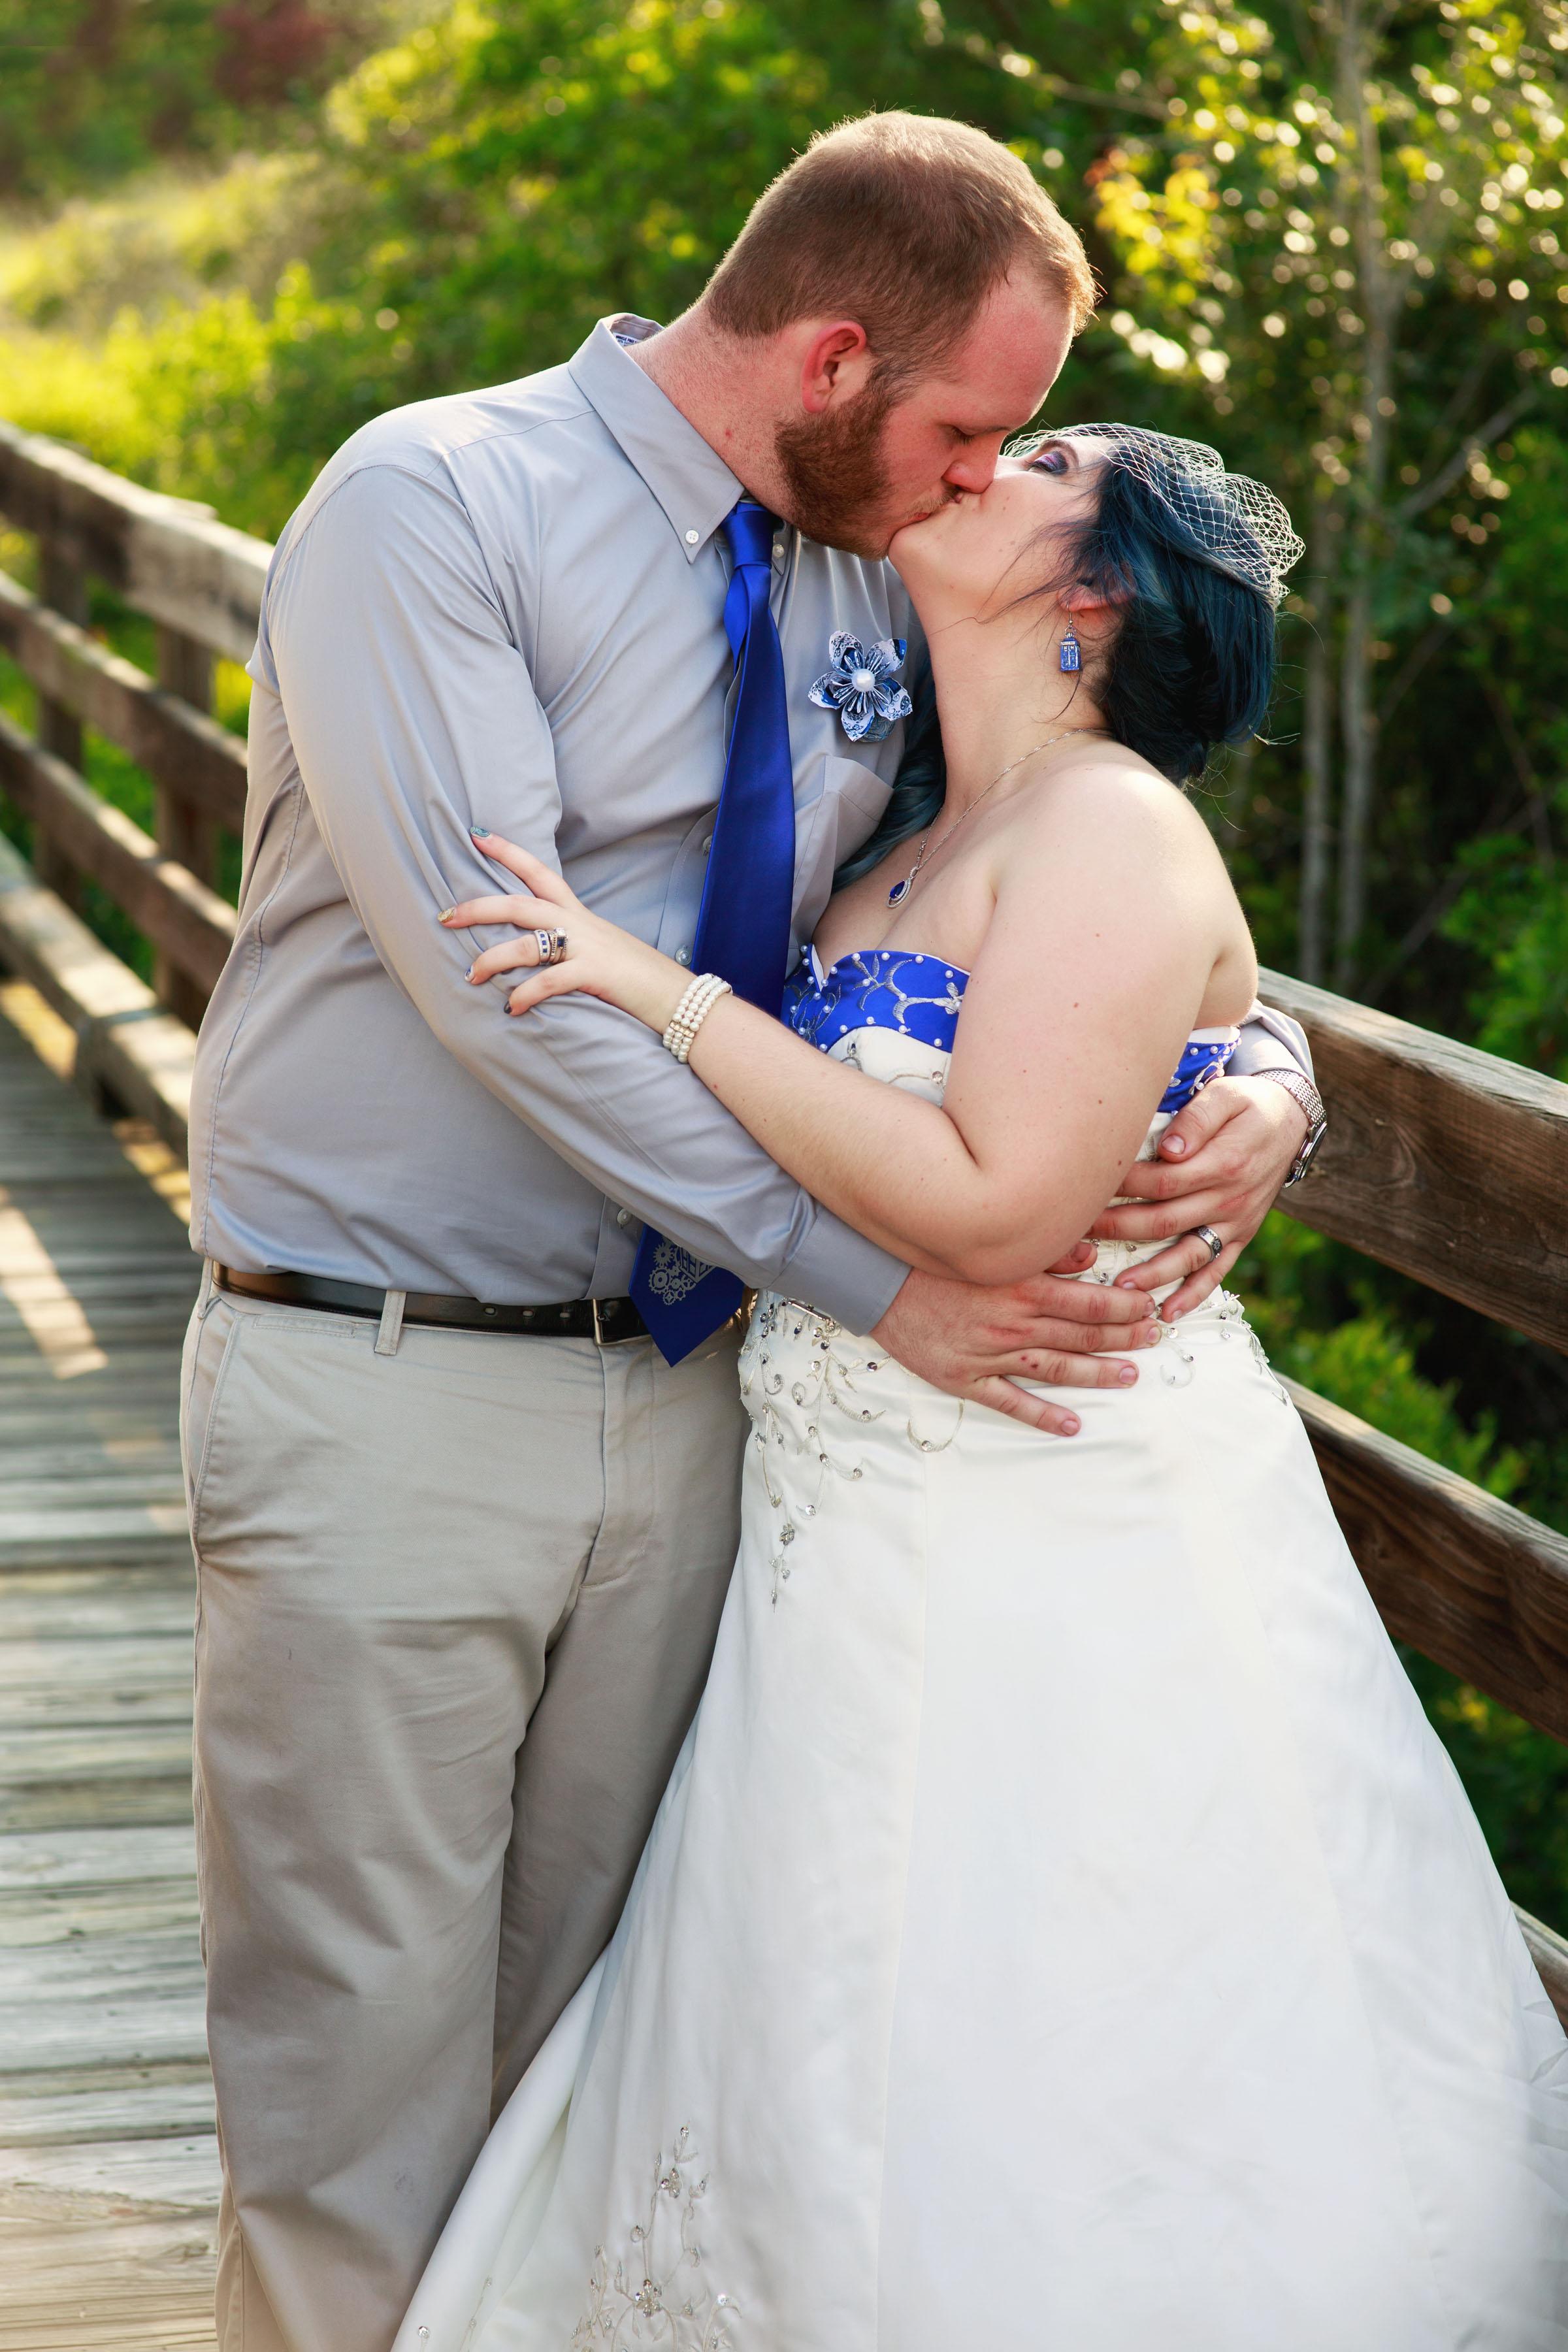 NC_Wedding_Photographer_Tiffany_Abruzzo_Photography_35.jpg